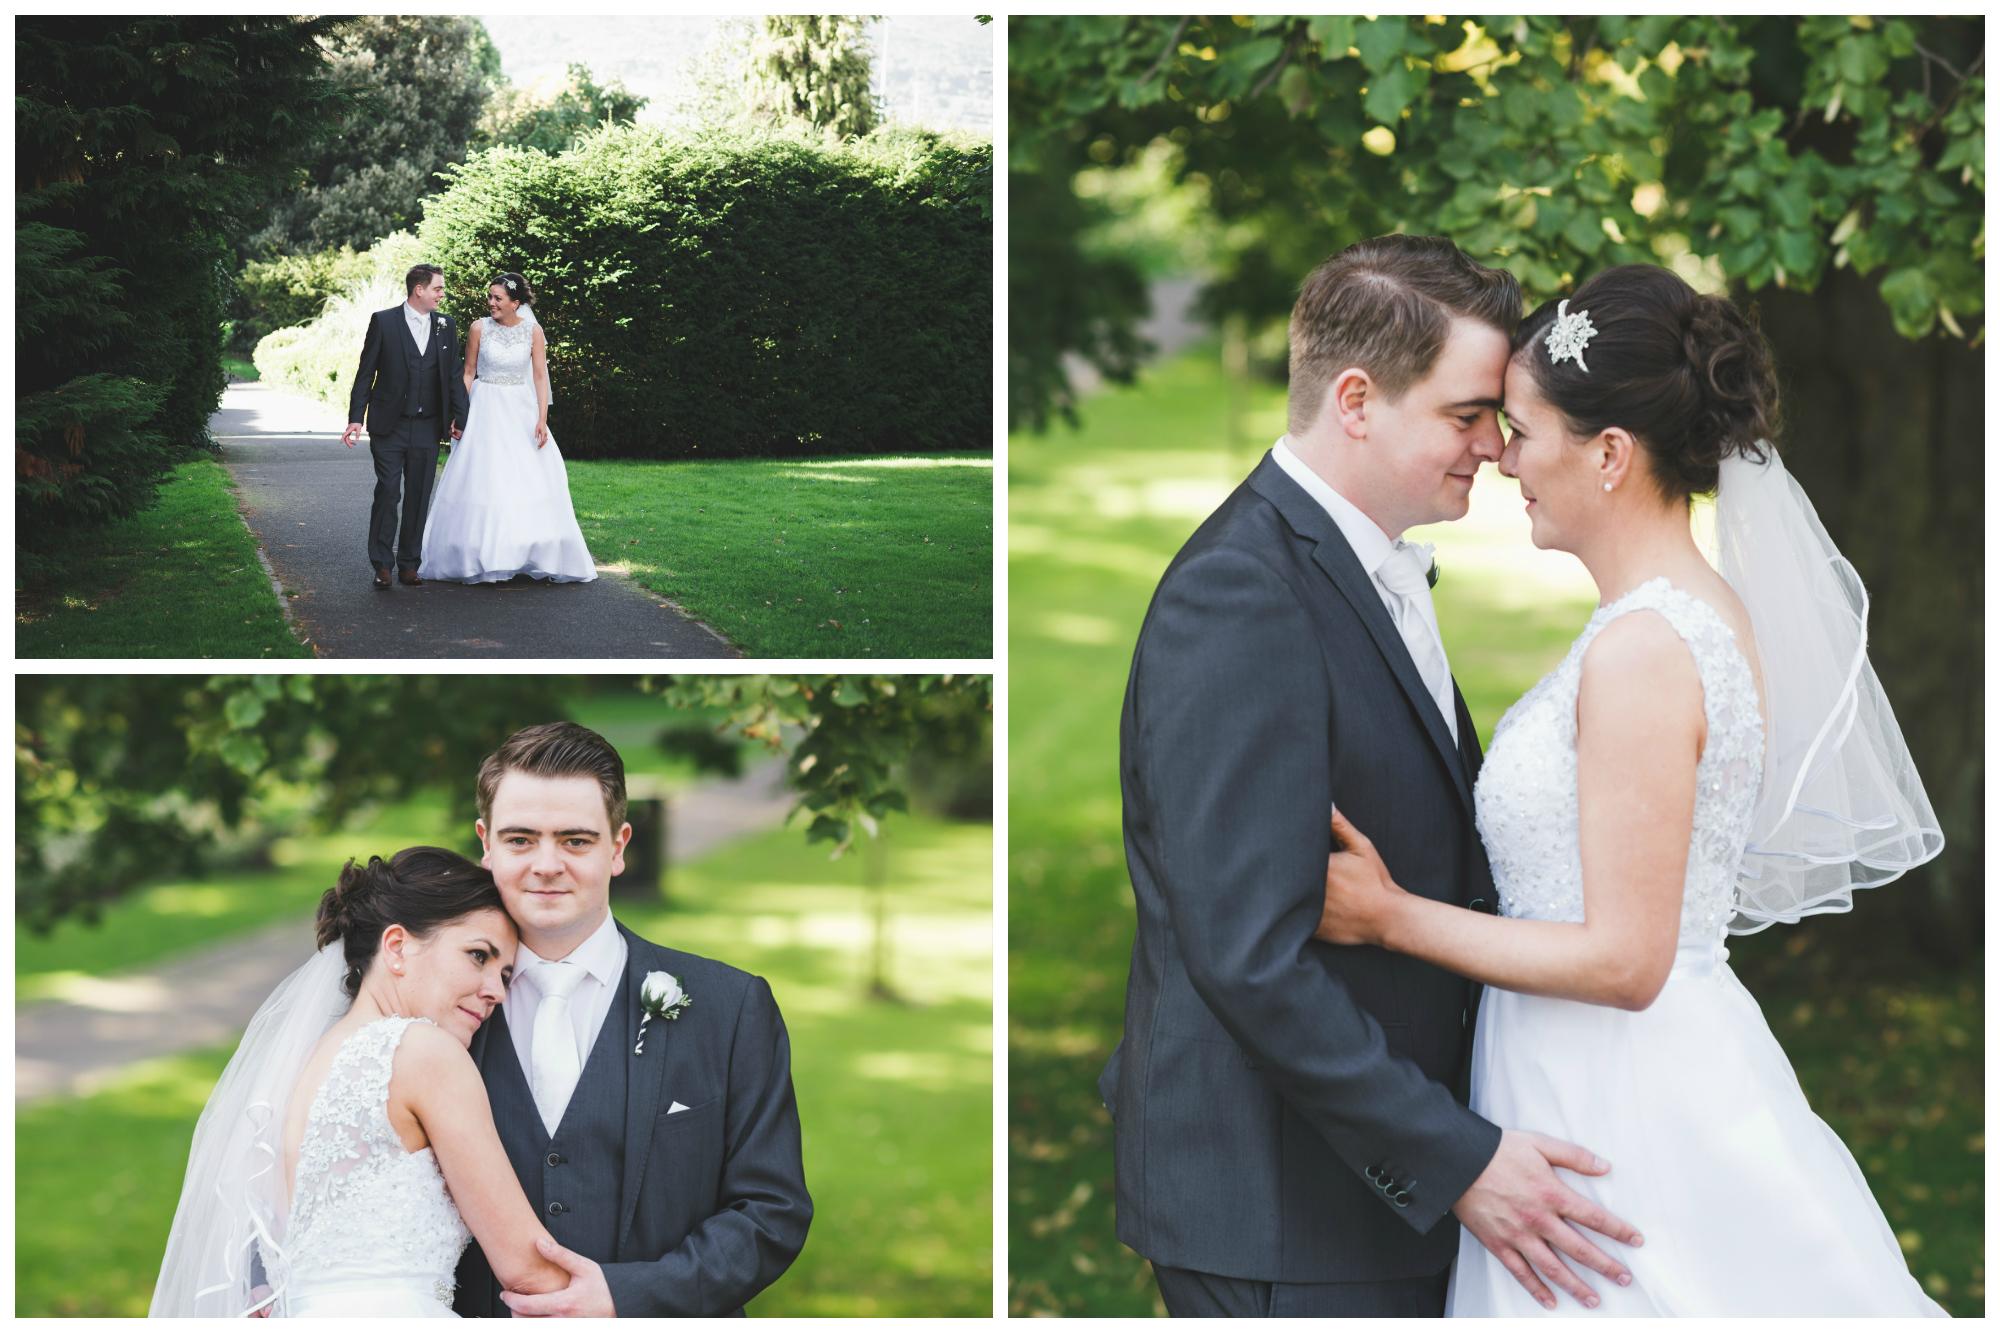 Belfast_Wedding_Photographer_Purephotoni_Musgrave_Park_Bride_and_Groom_Portraits.jpg